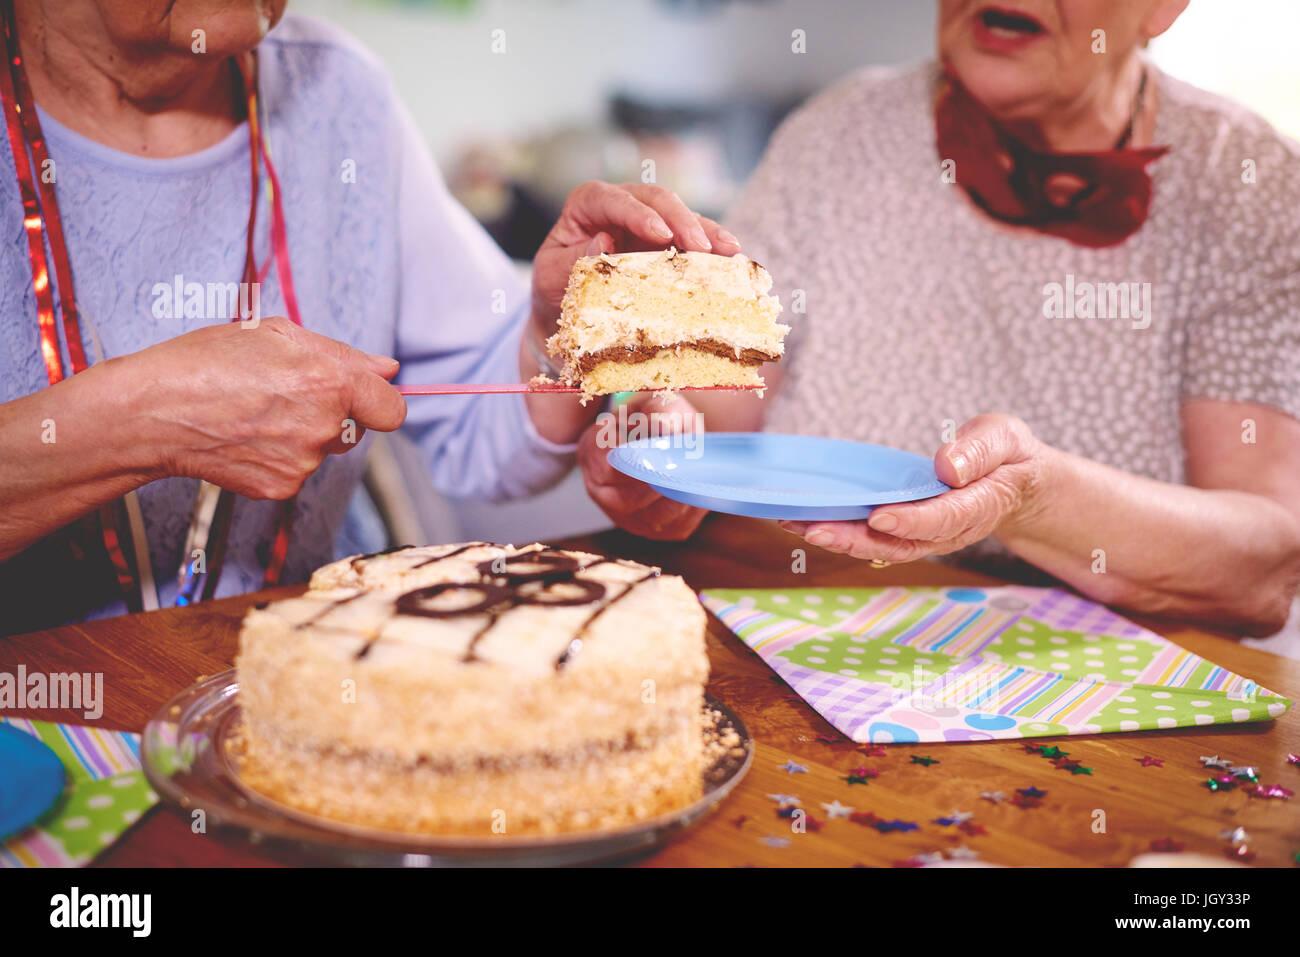 Senior women serving birthday cake at party - Stock Image